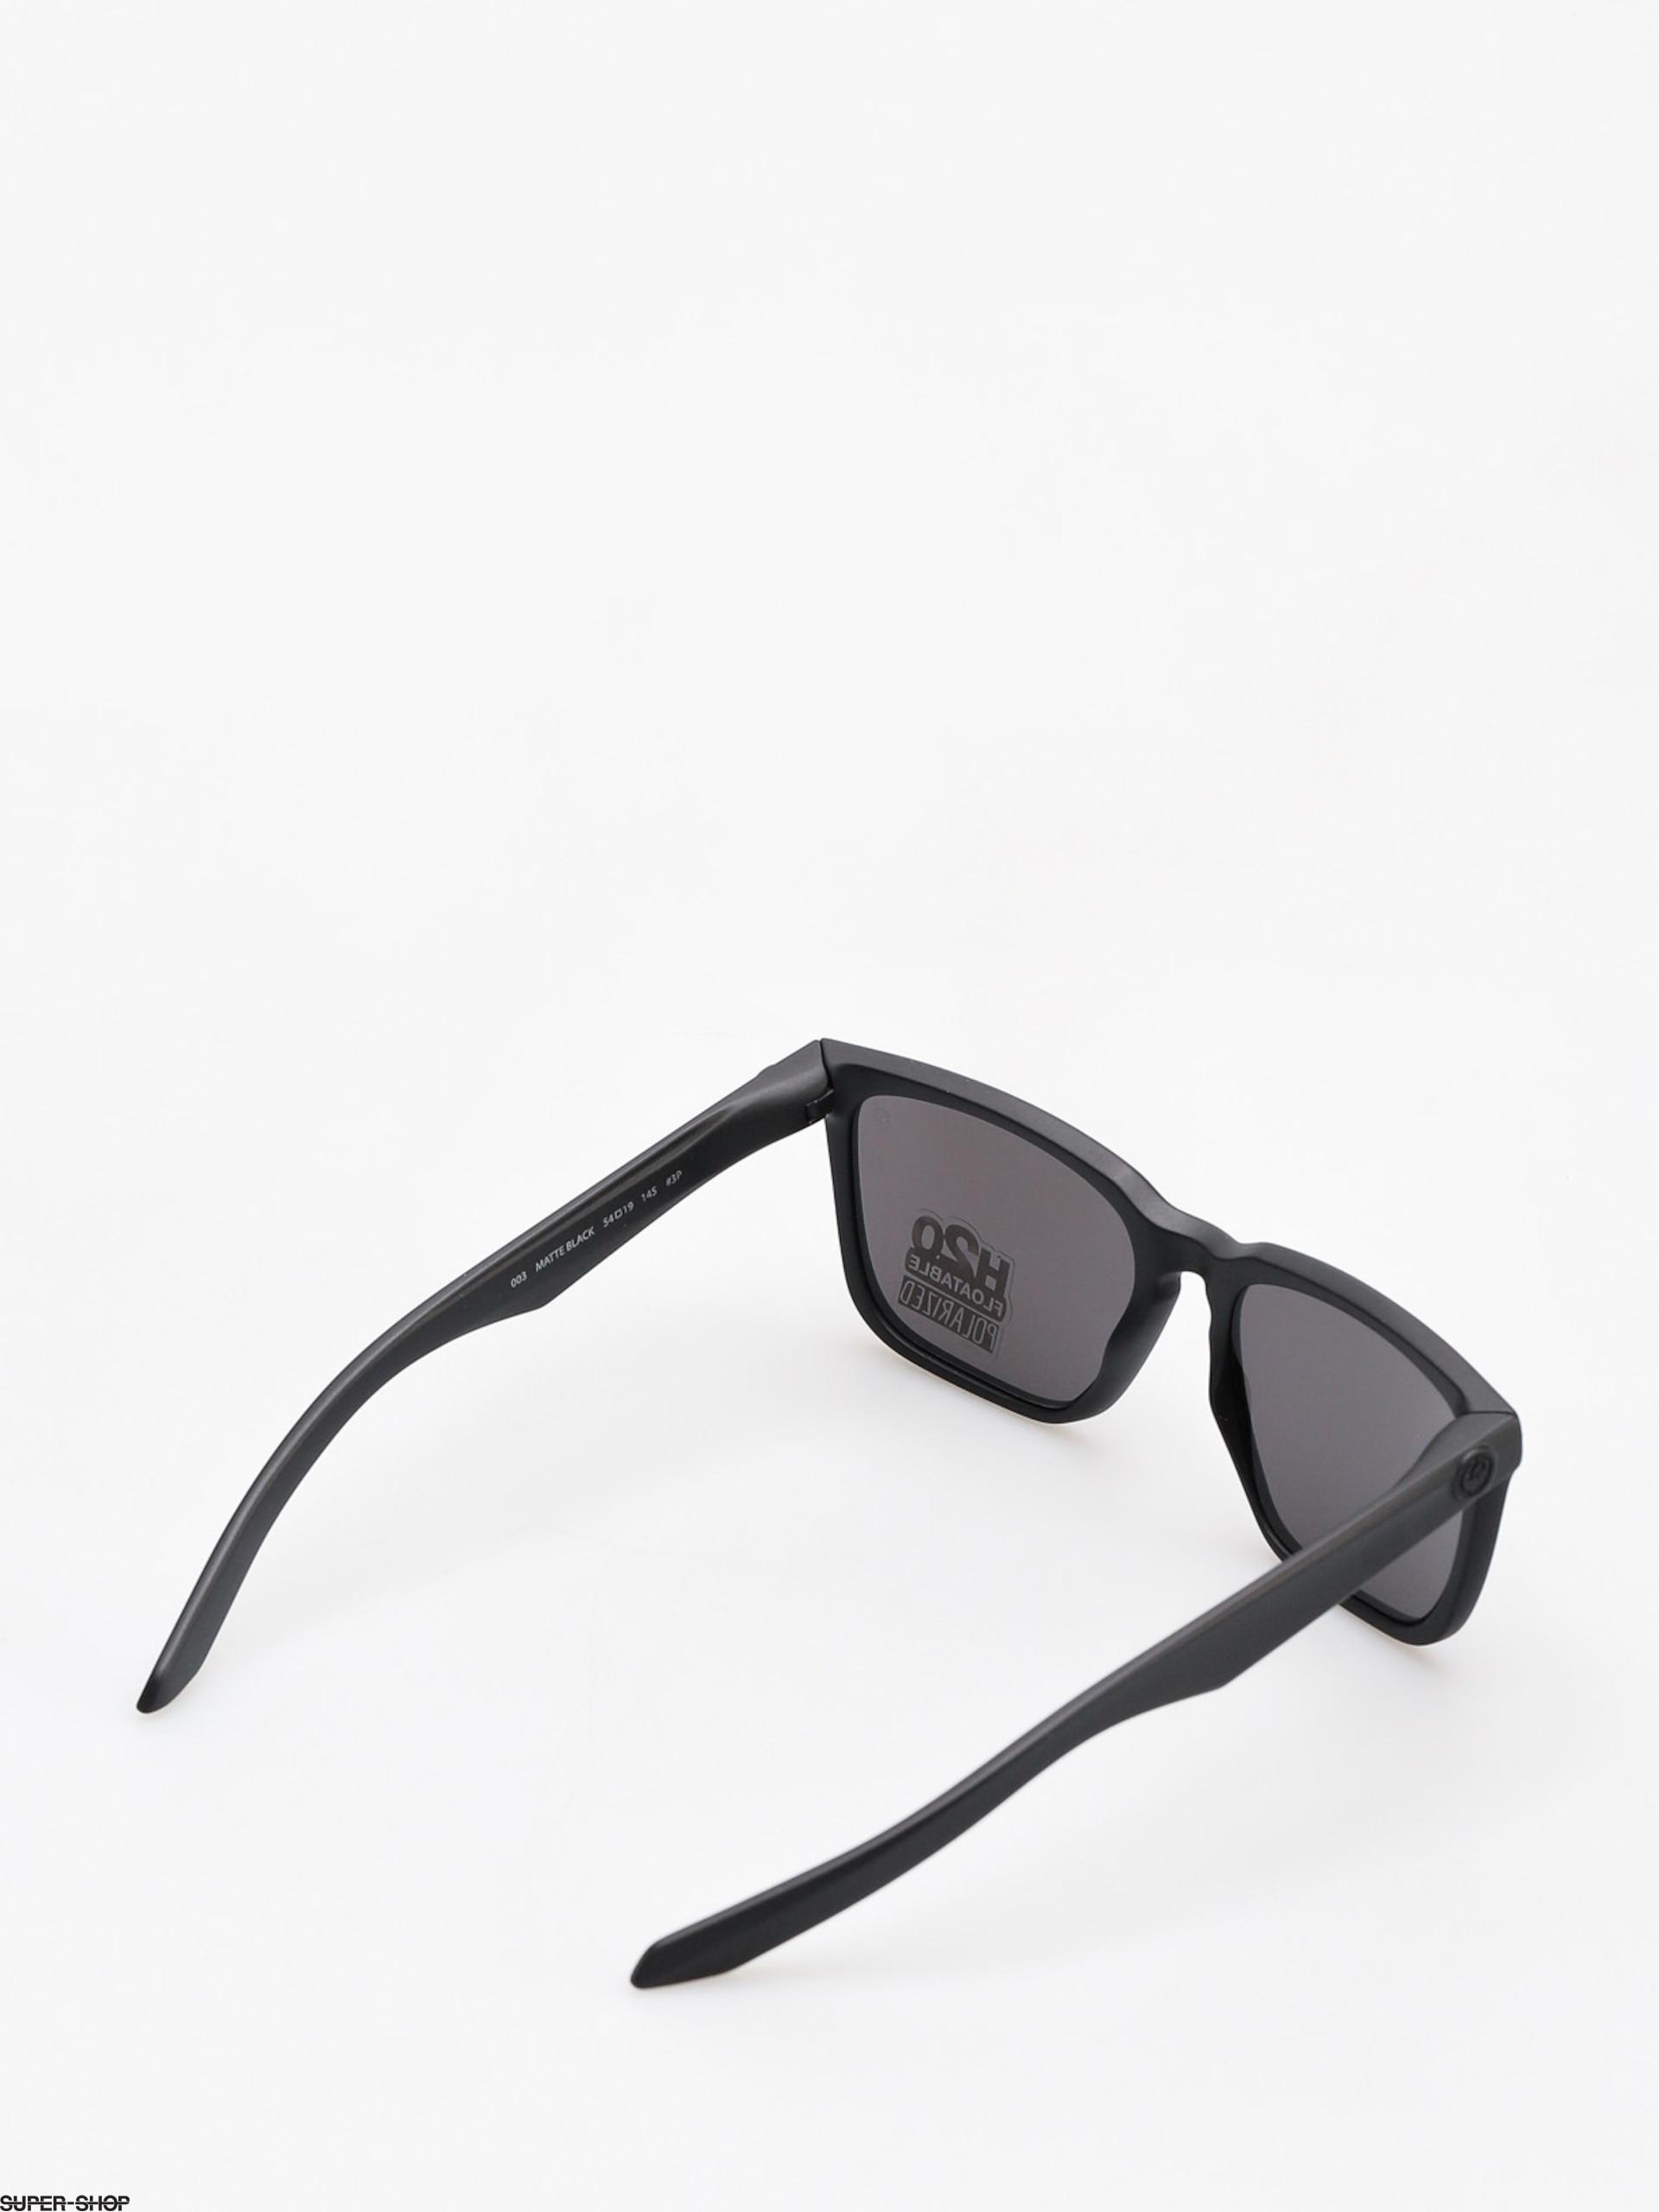 758d86d5438 Dragon Sunglasses Baile (matte black h20 smoke performance polar)